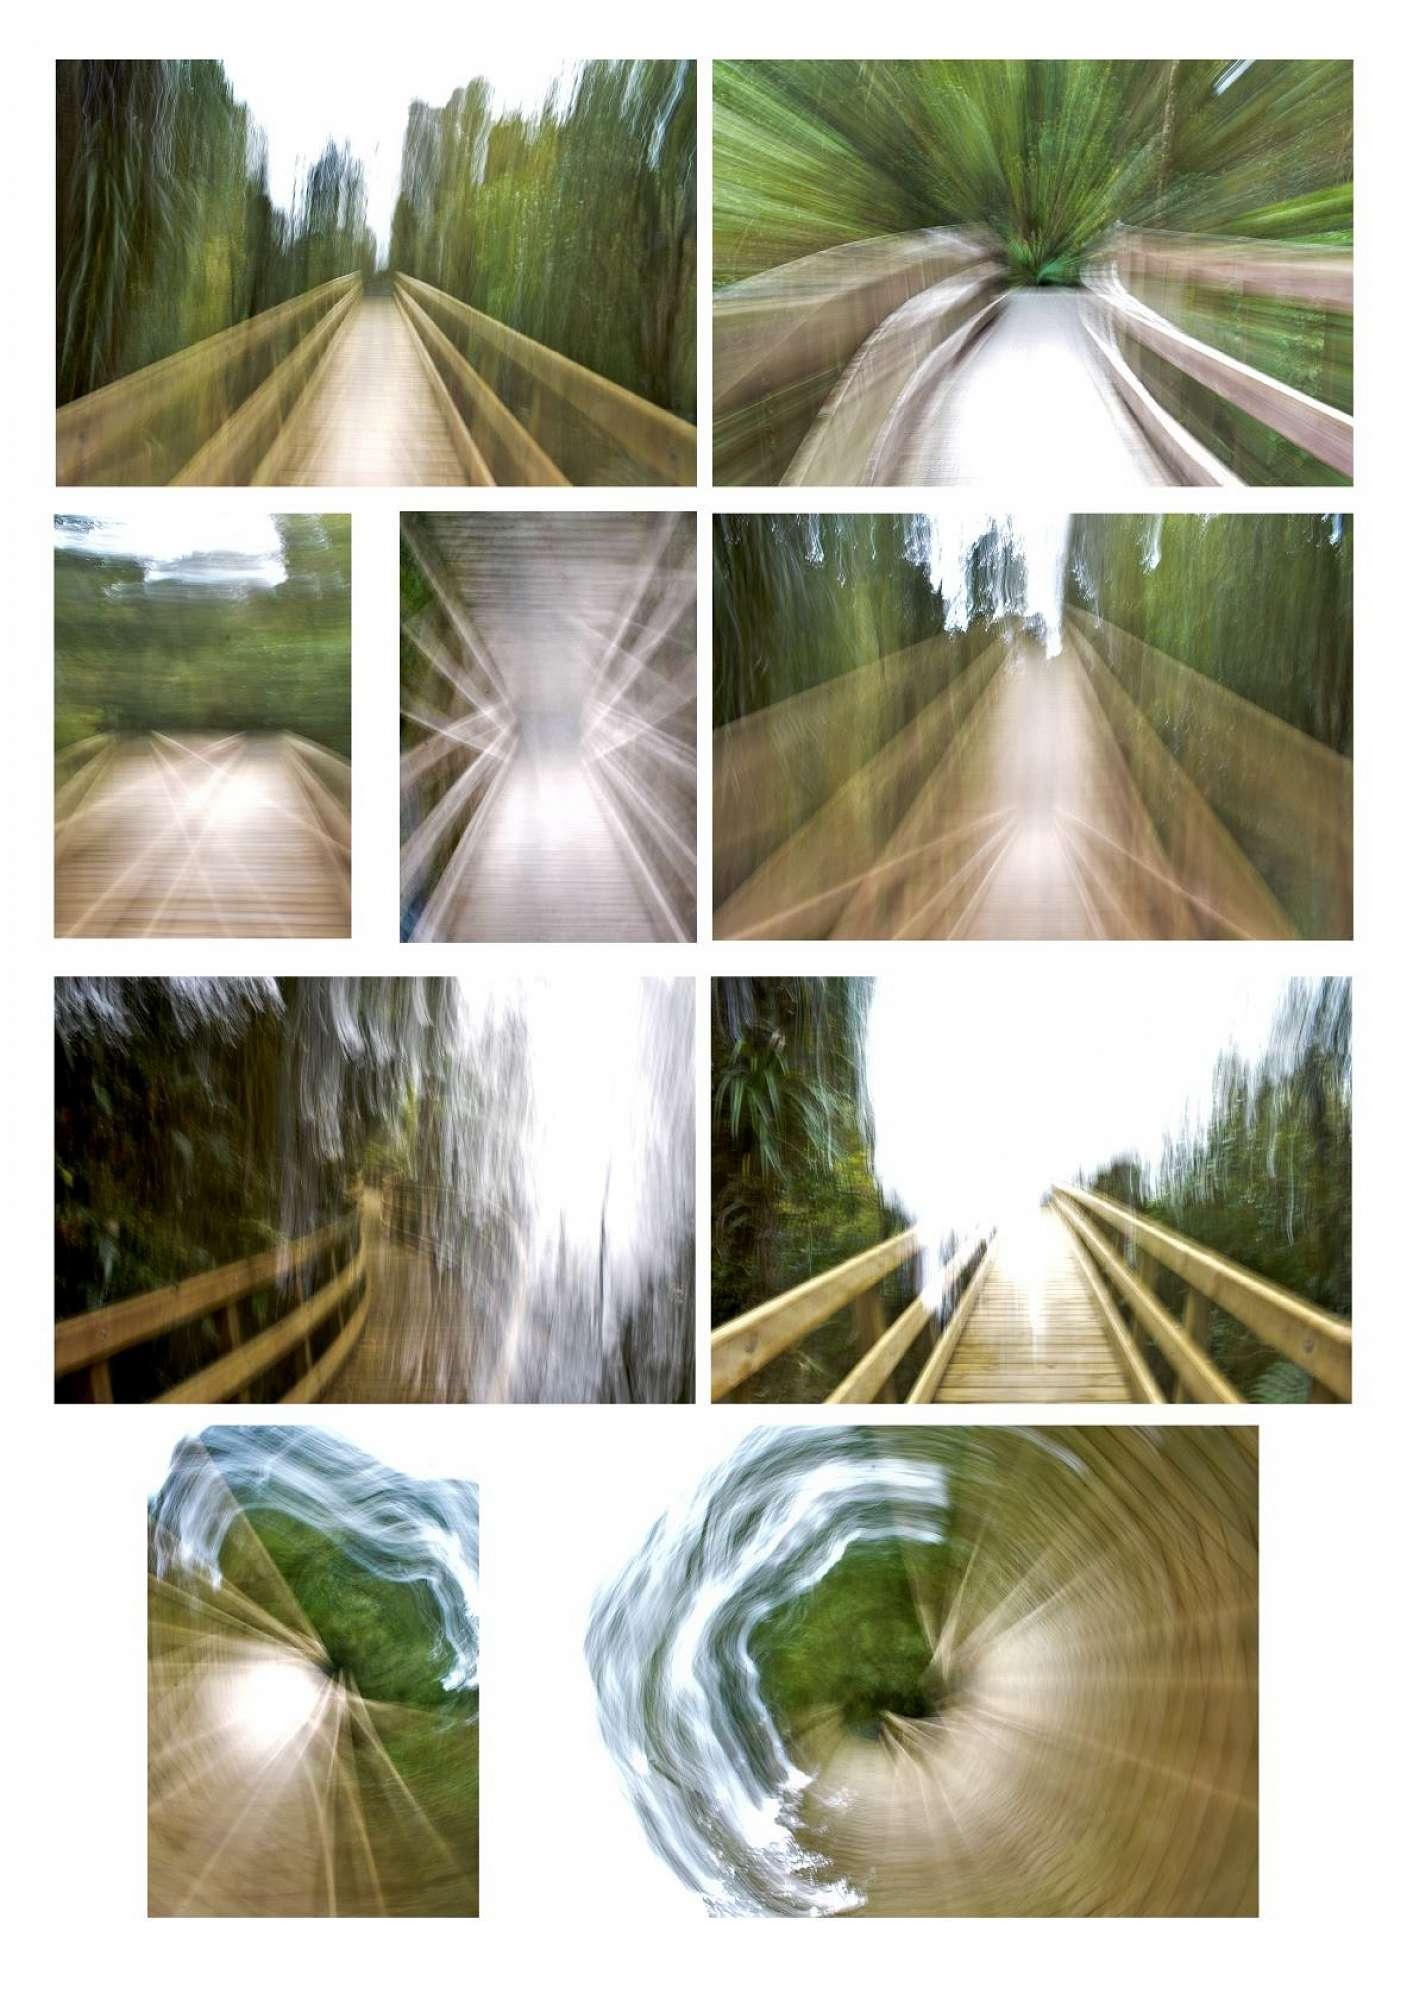 Joshua Nolan - NCEA Level 2 Photography portfolio (Right side)